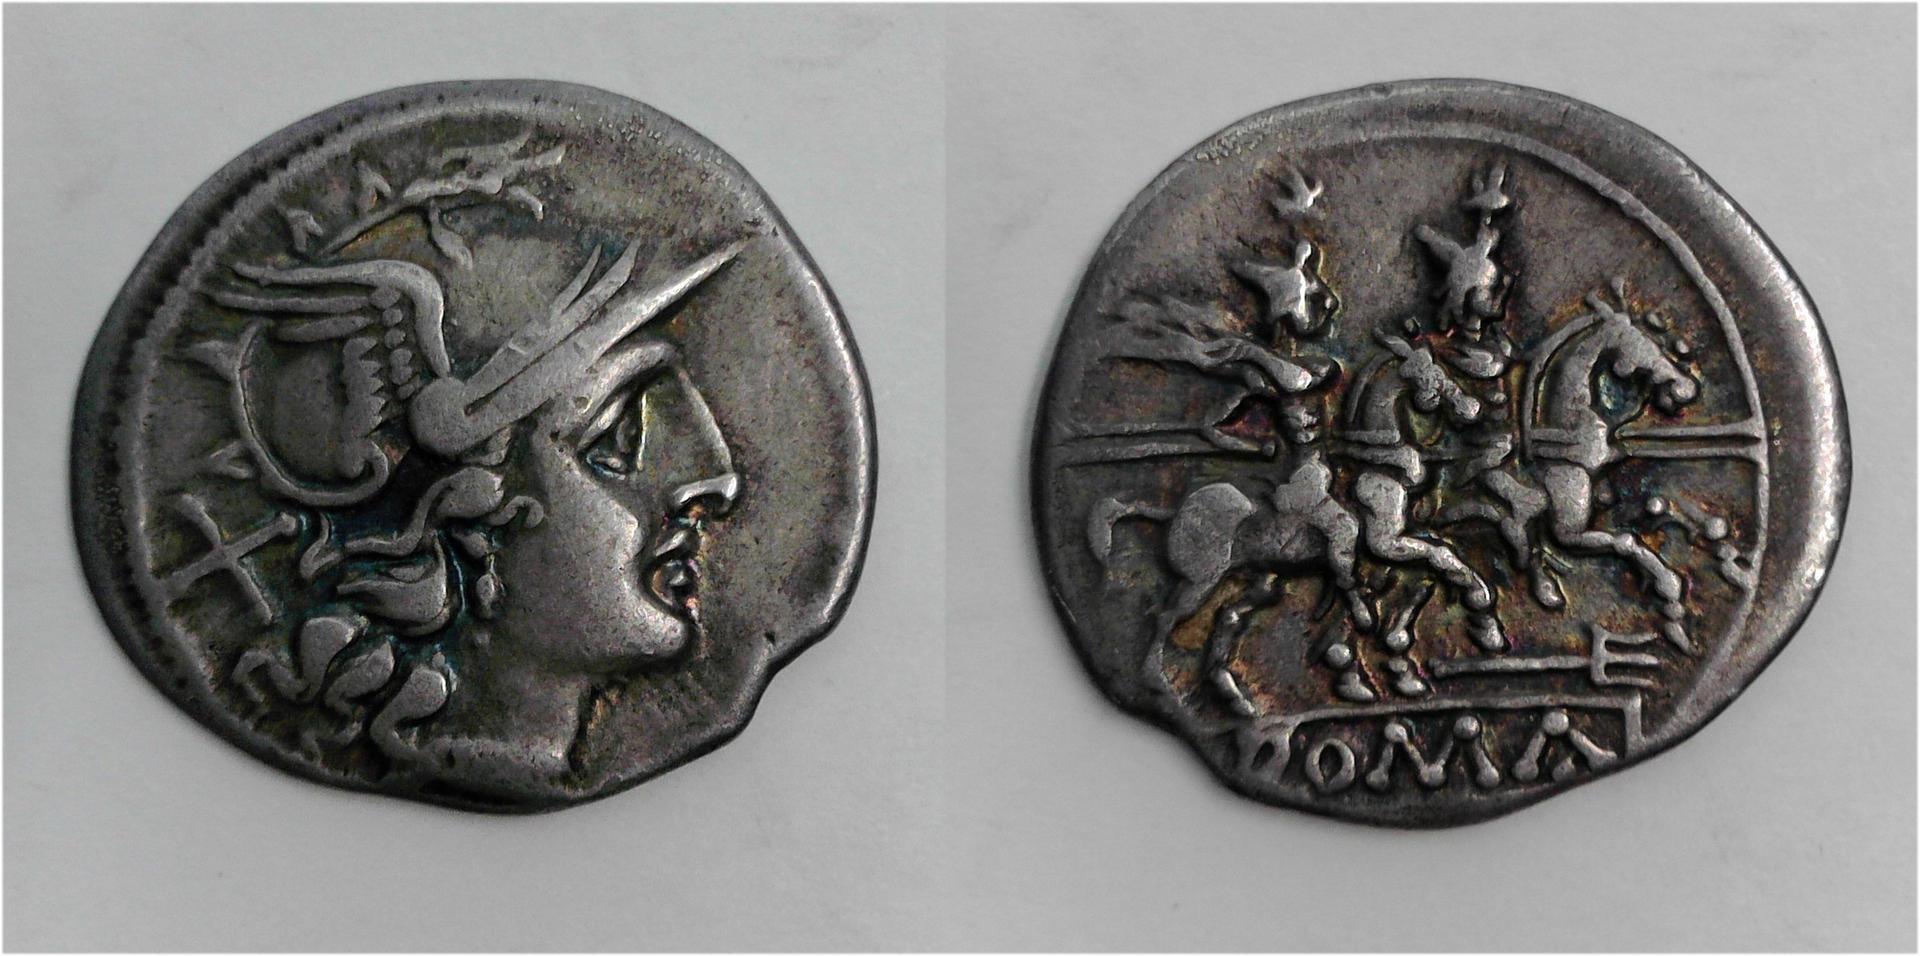 Anonymous Trident, 206-195 BC, C. 115/1